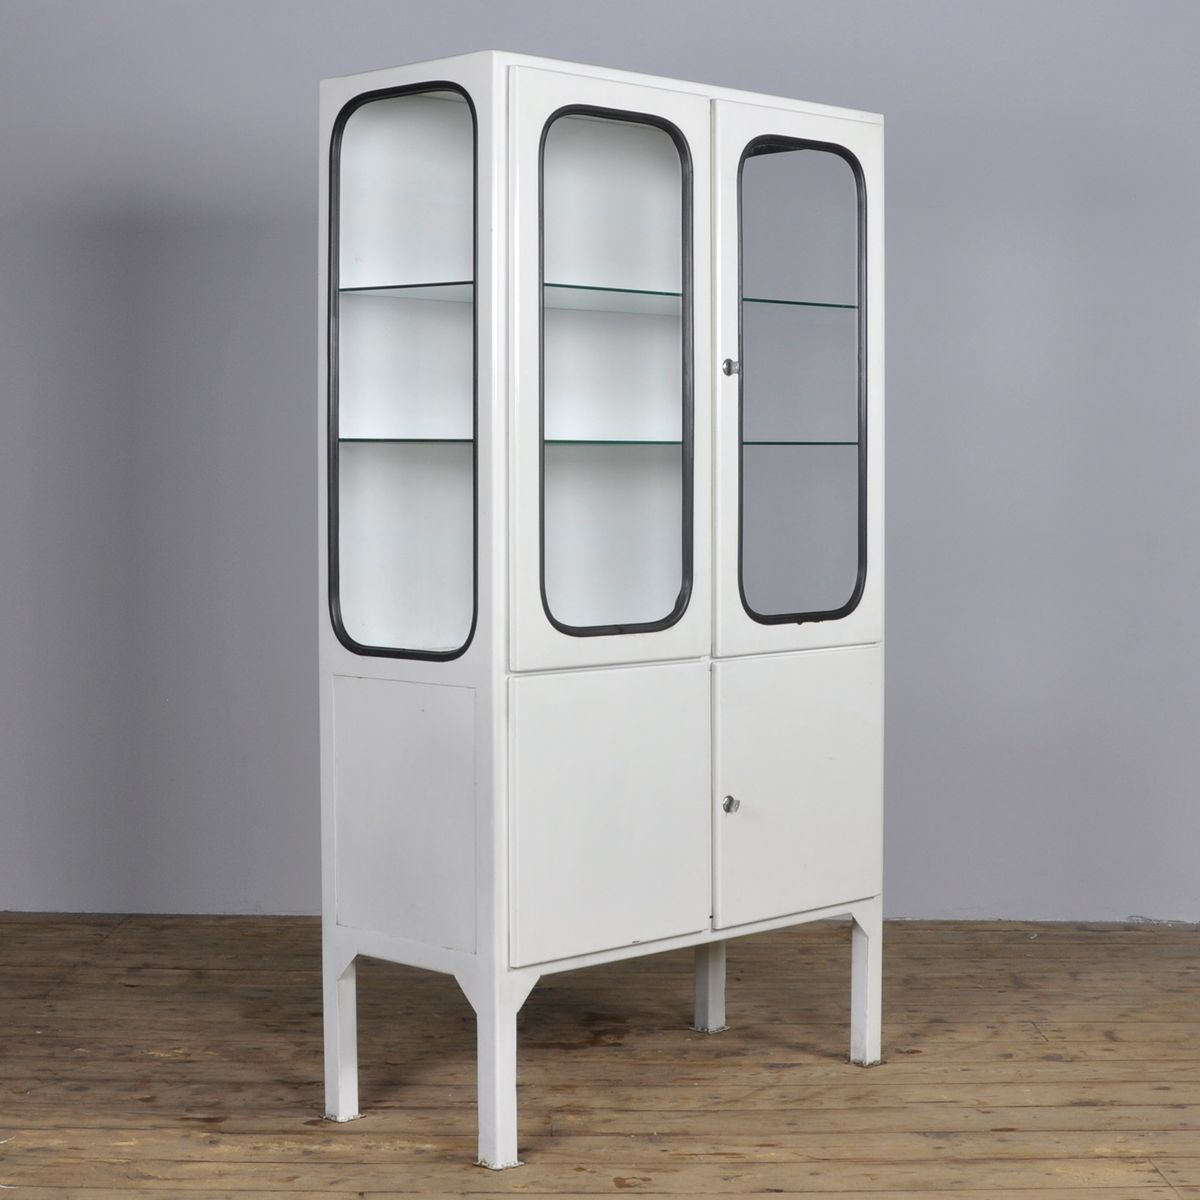 armoire pharmacie vintage en verre en fer forg 1970s en vente sur pamono. Black Bedroom Furniture Sets. Home Design Ideas